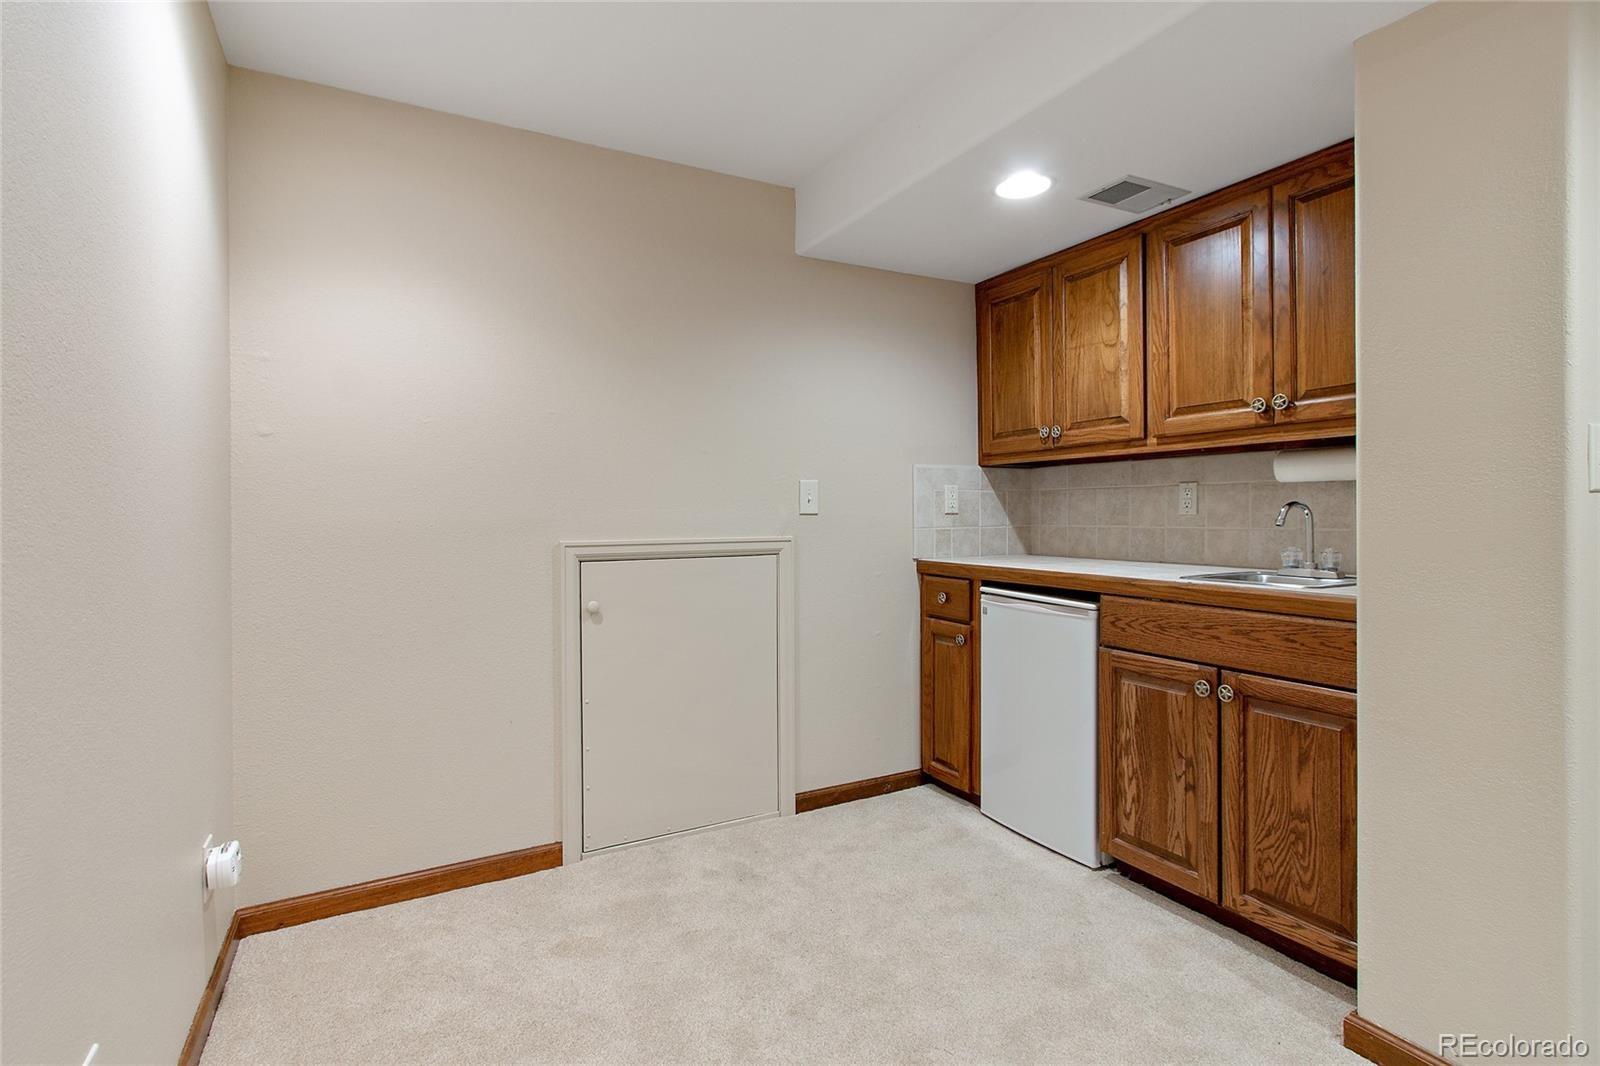 MLS# 1902527 - 24 - 29080 Pinewood Vista Drive, Evergreen, CO 80439